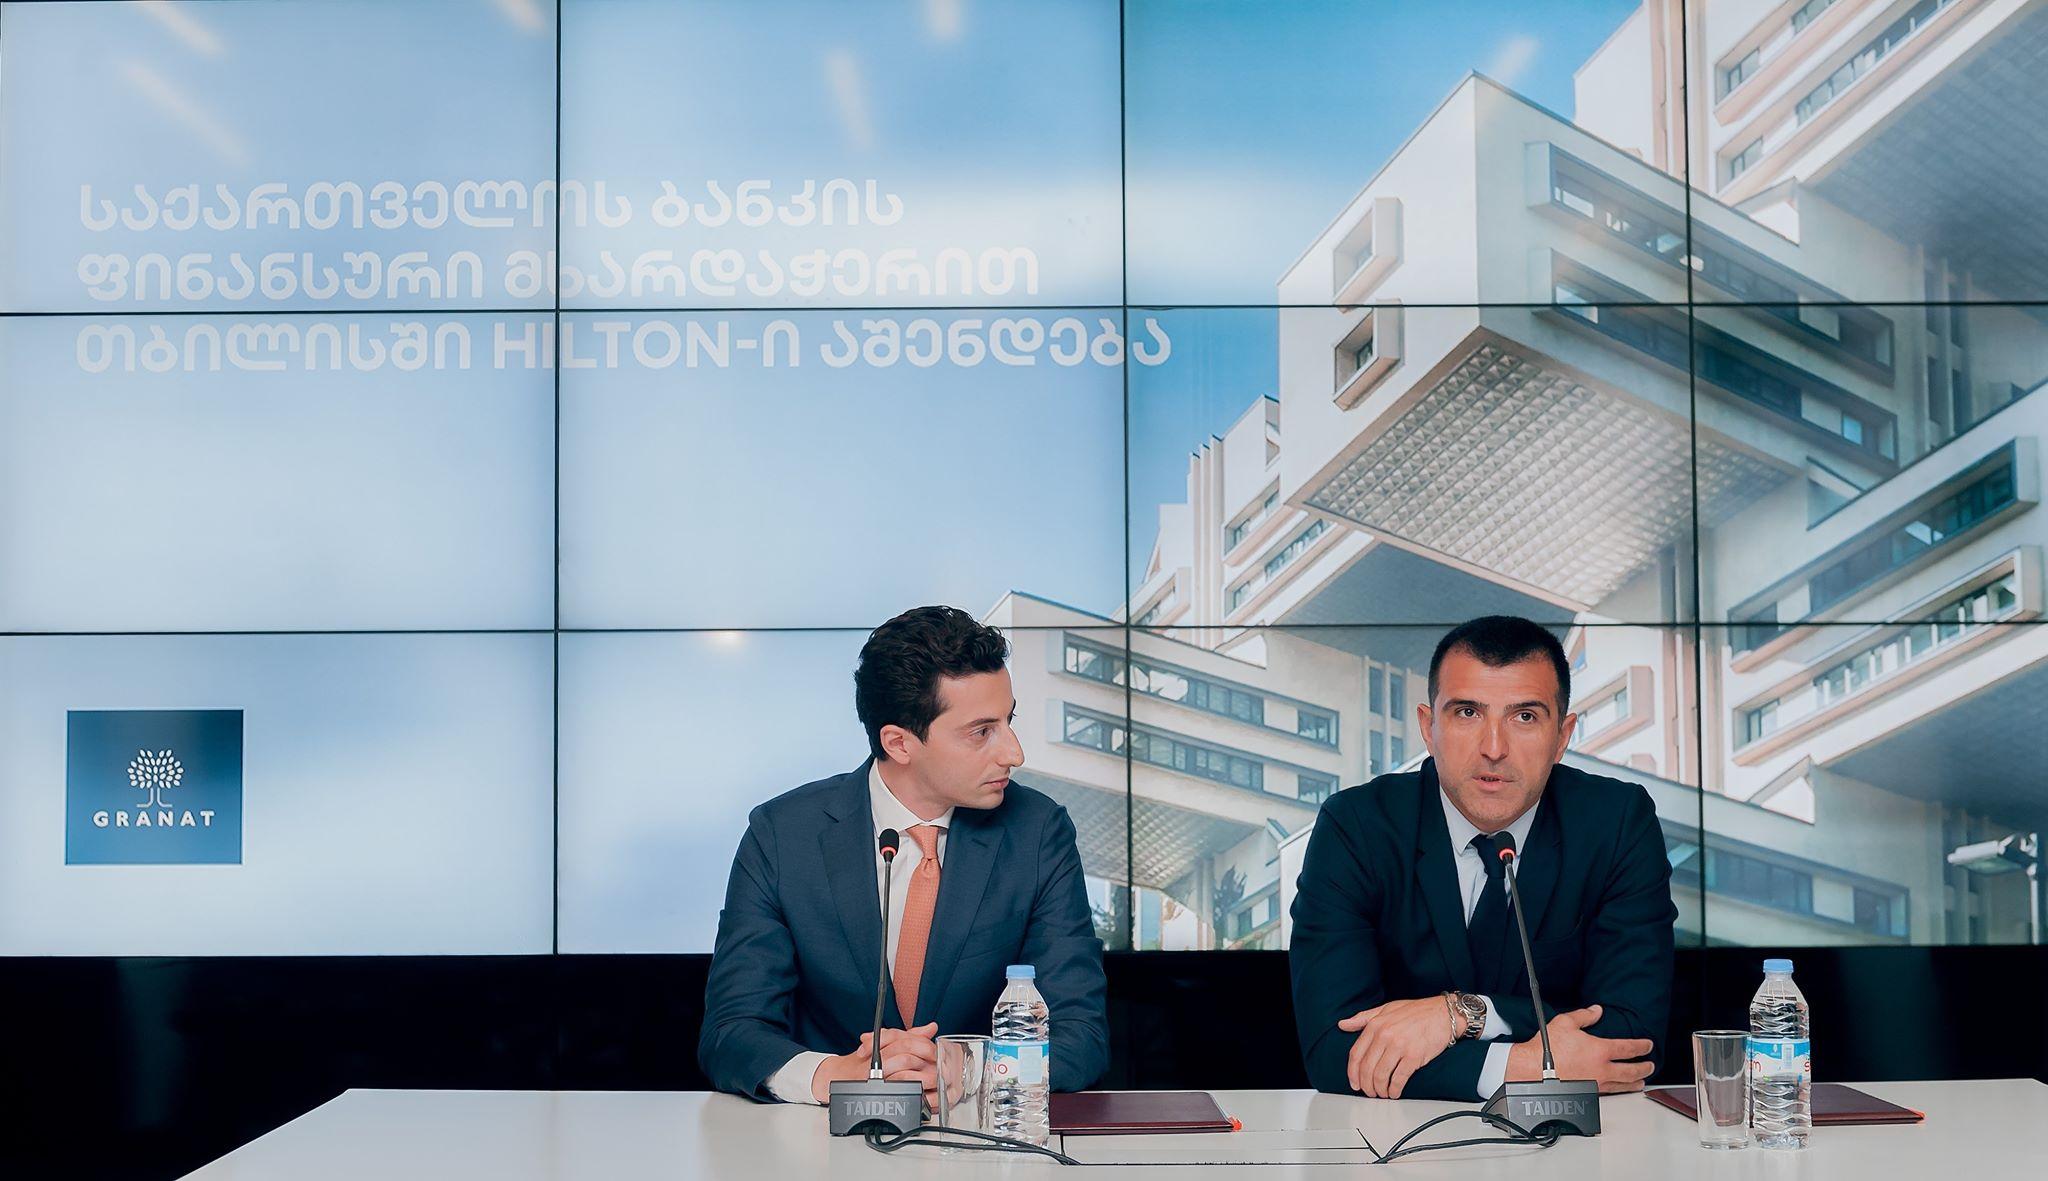 Photo of საქართველოს ბანკის ფინანსური მხარდაჭერით თბილისში Hilton-ი აშენდება